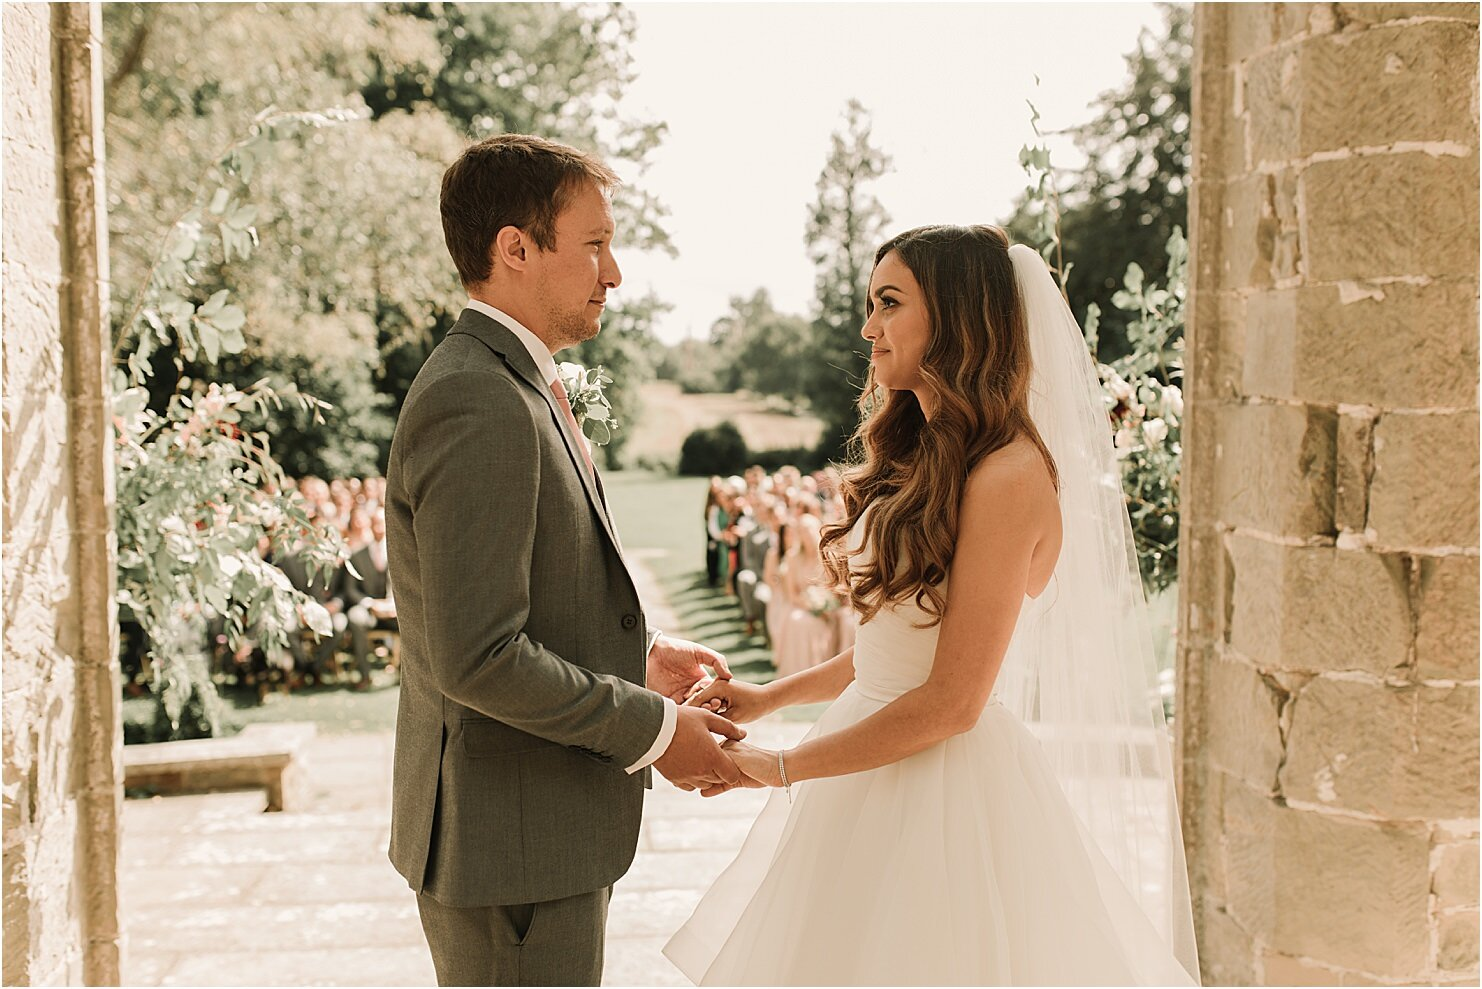 boda-de-cuento-en-castillo-boda-en-londres-54.jpg